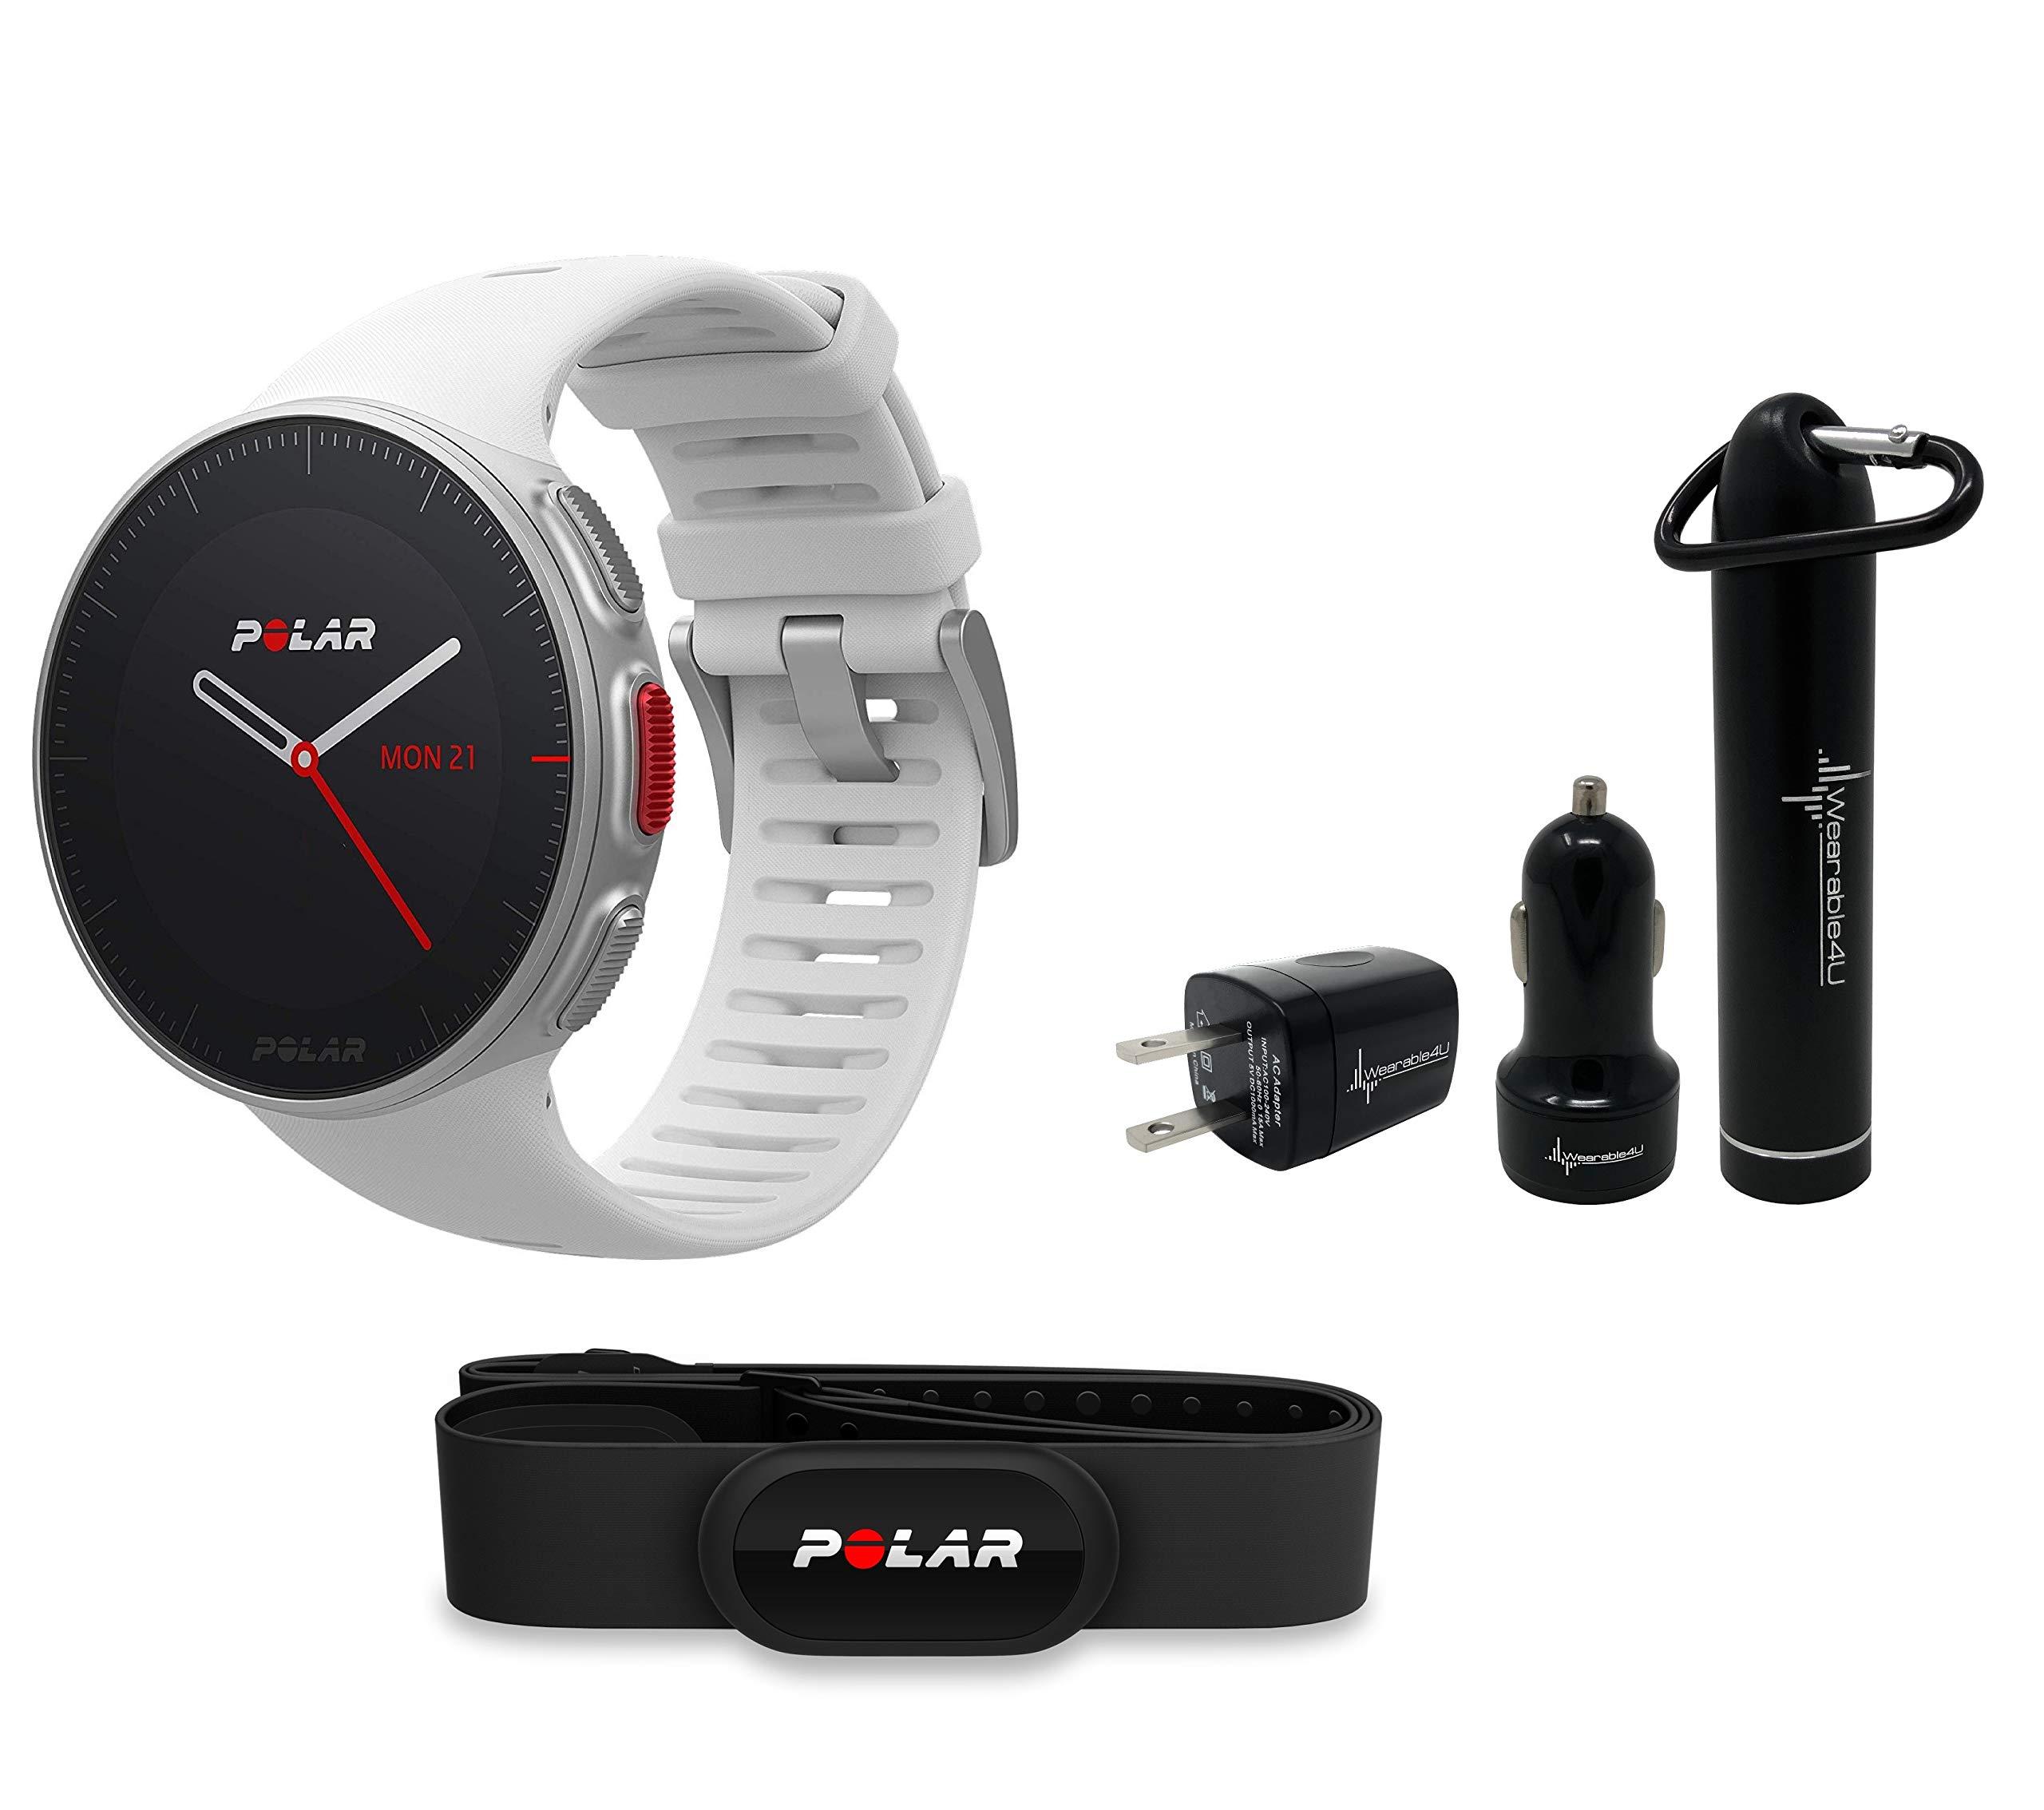 Polar Vantage V Pro Multisport GPS Watch and Wearable4U Ultimate Power Pack Bundle